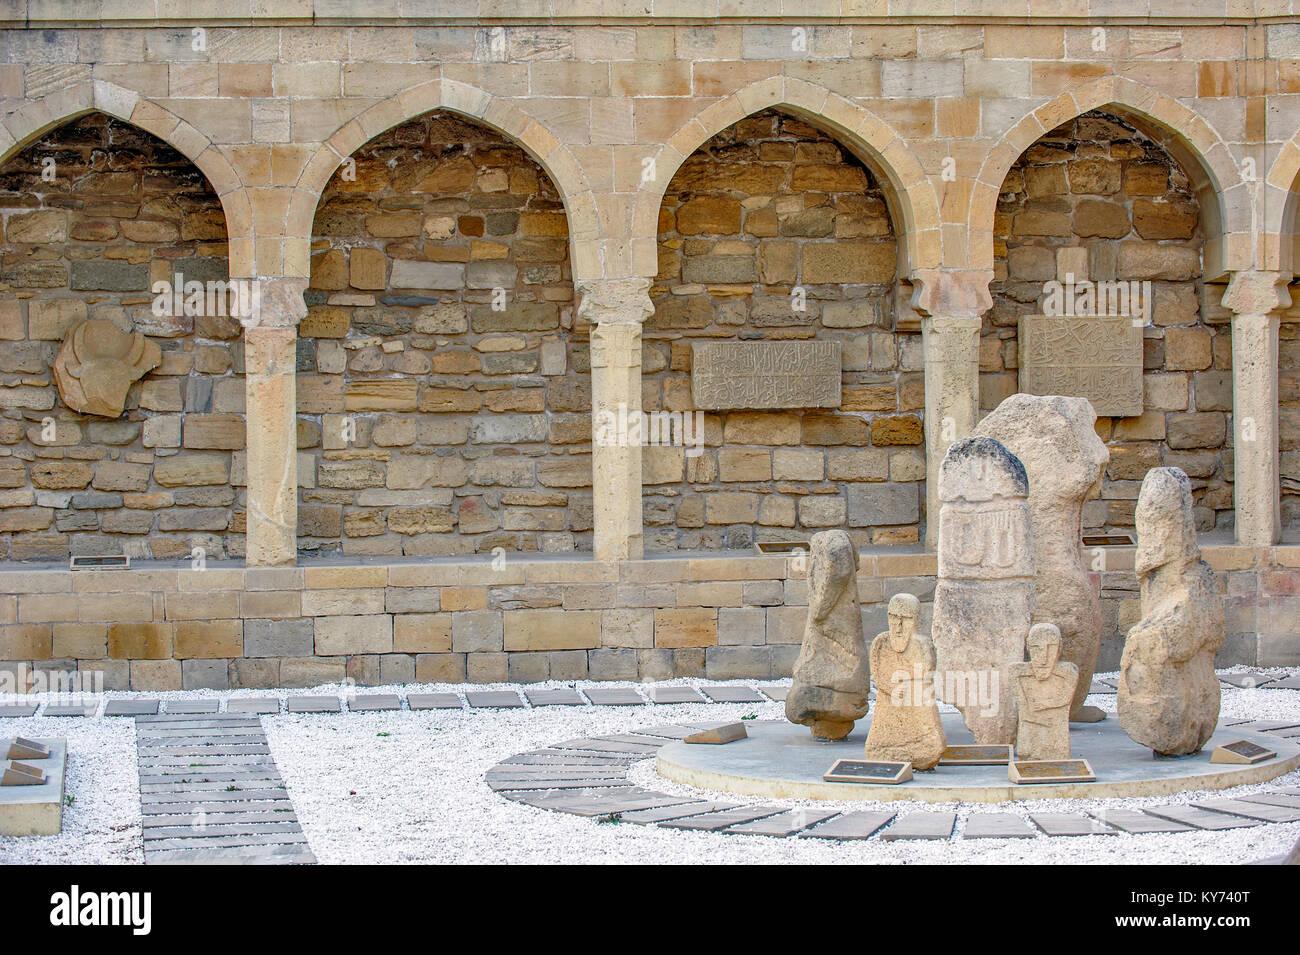 Archaeological exposition in old city, Baku, Azerbaijan - Stock Image